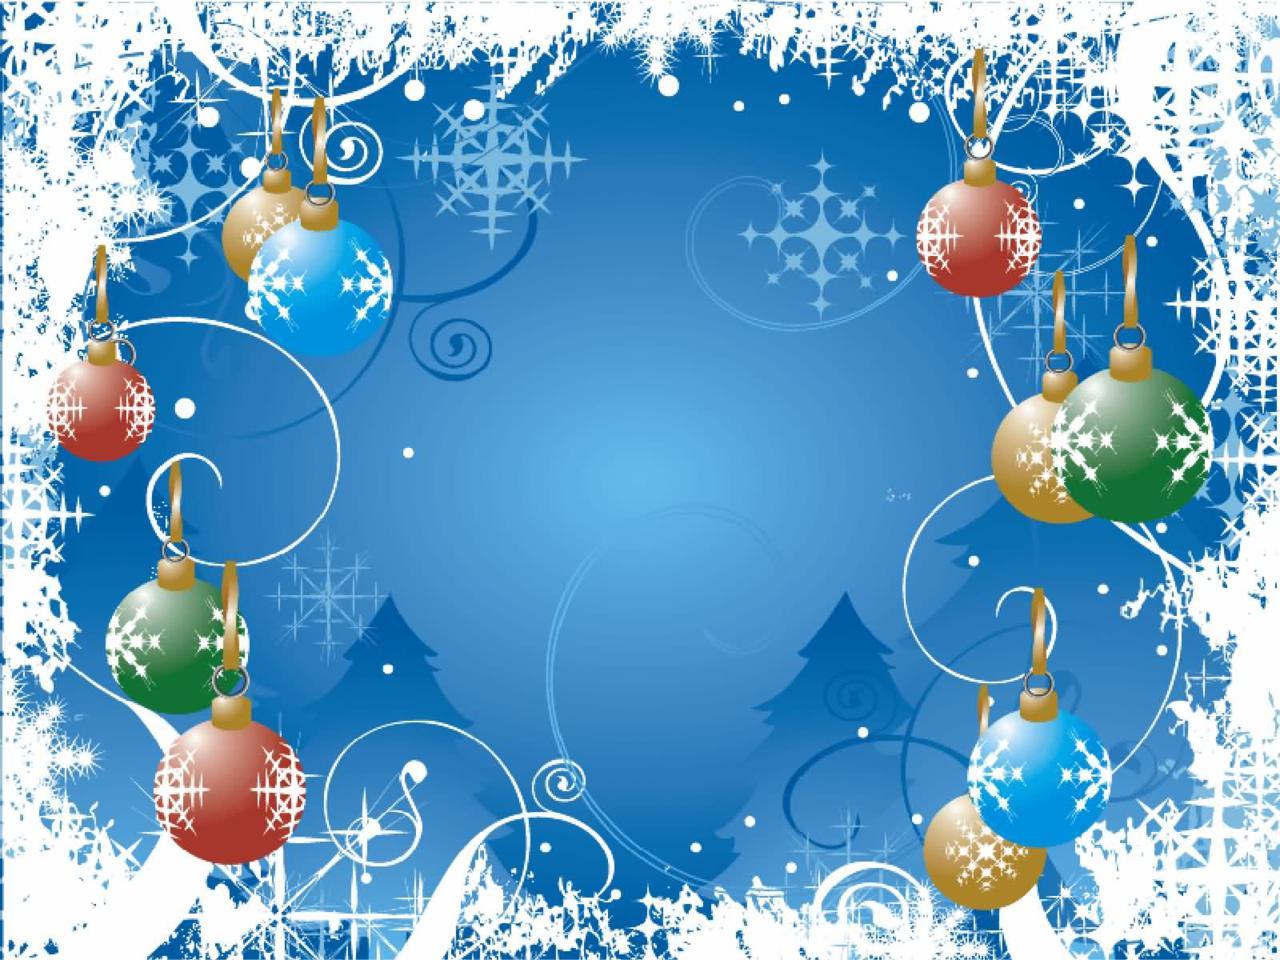 Christmas backgrounds desktop   SF Wallpaper 1280x960